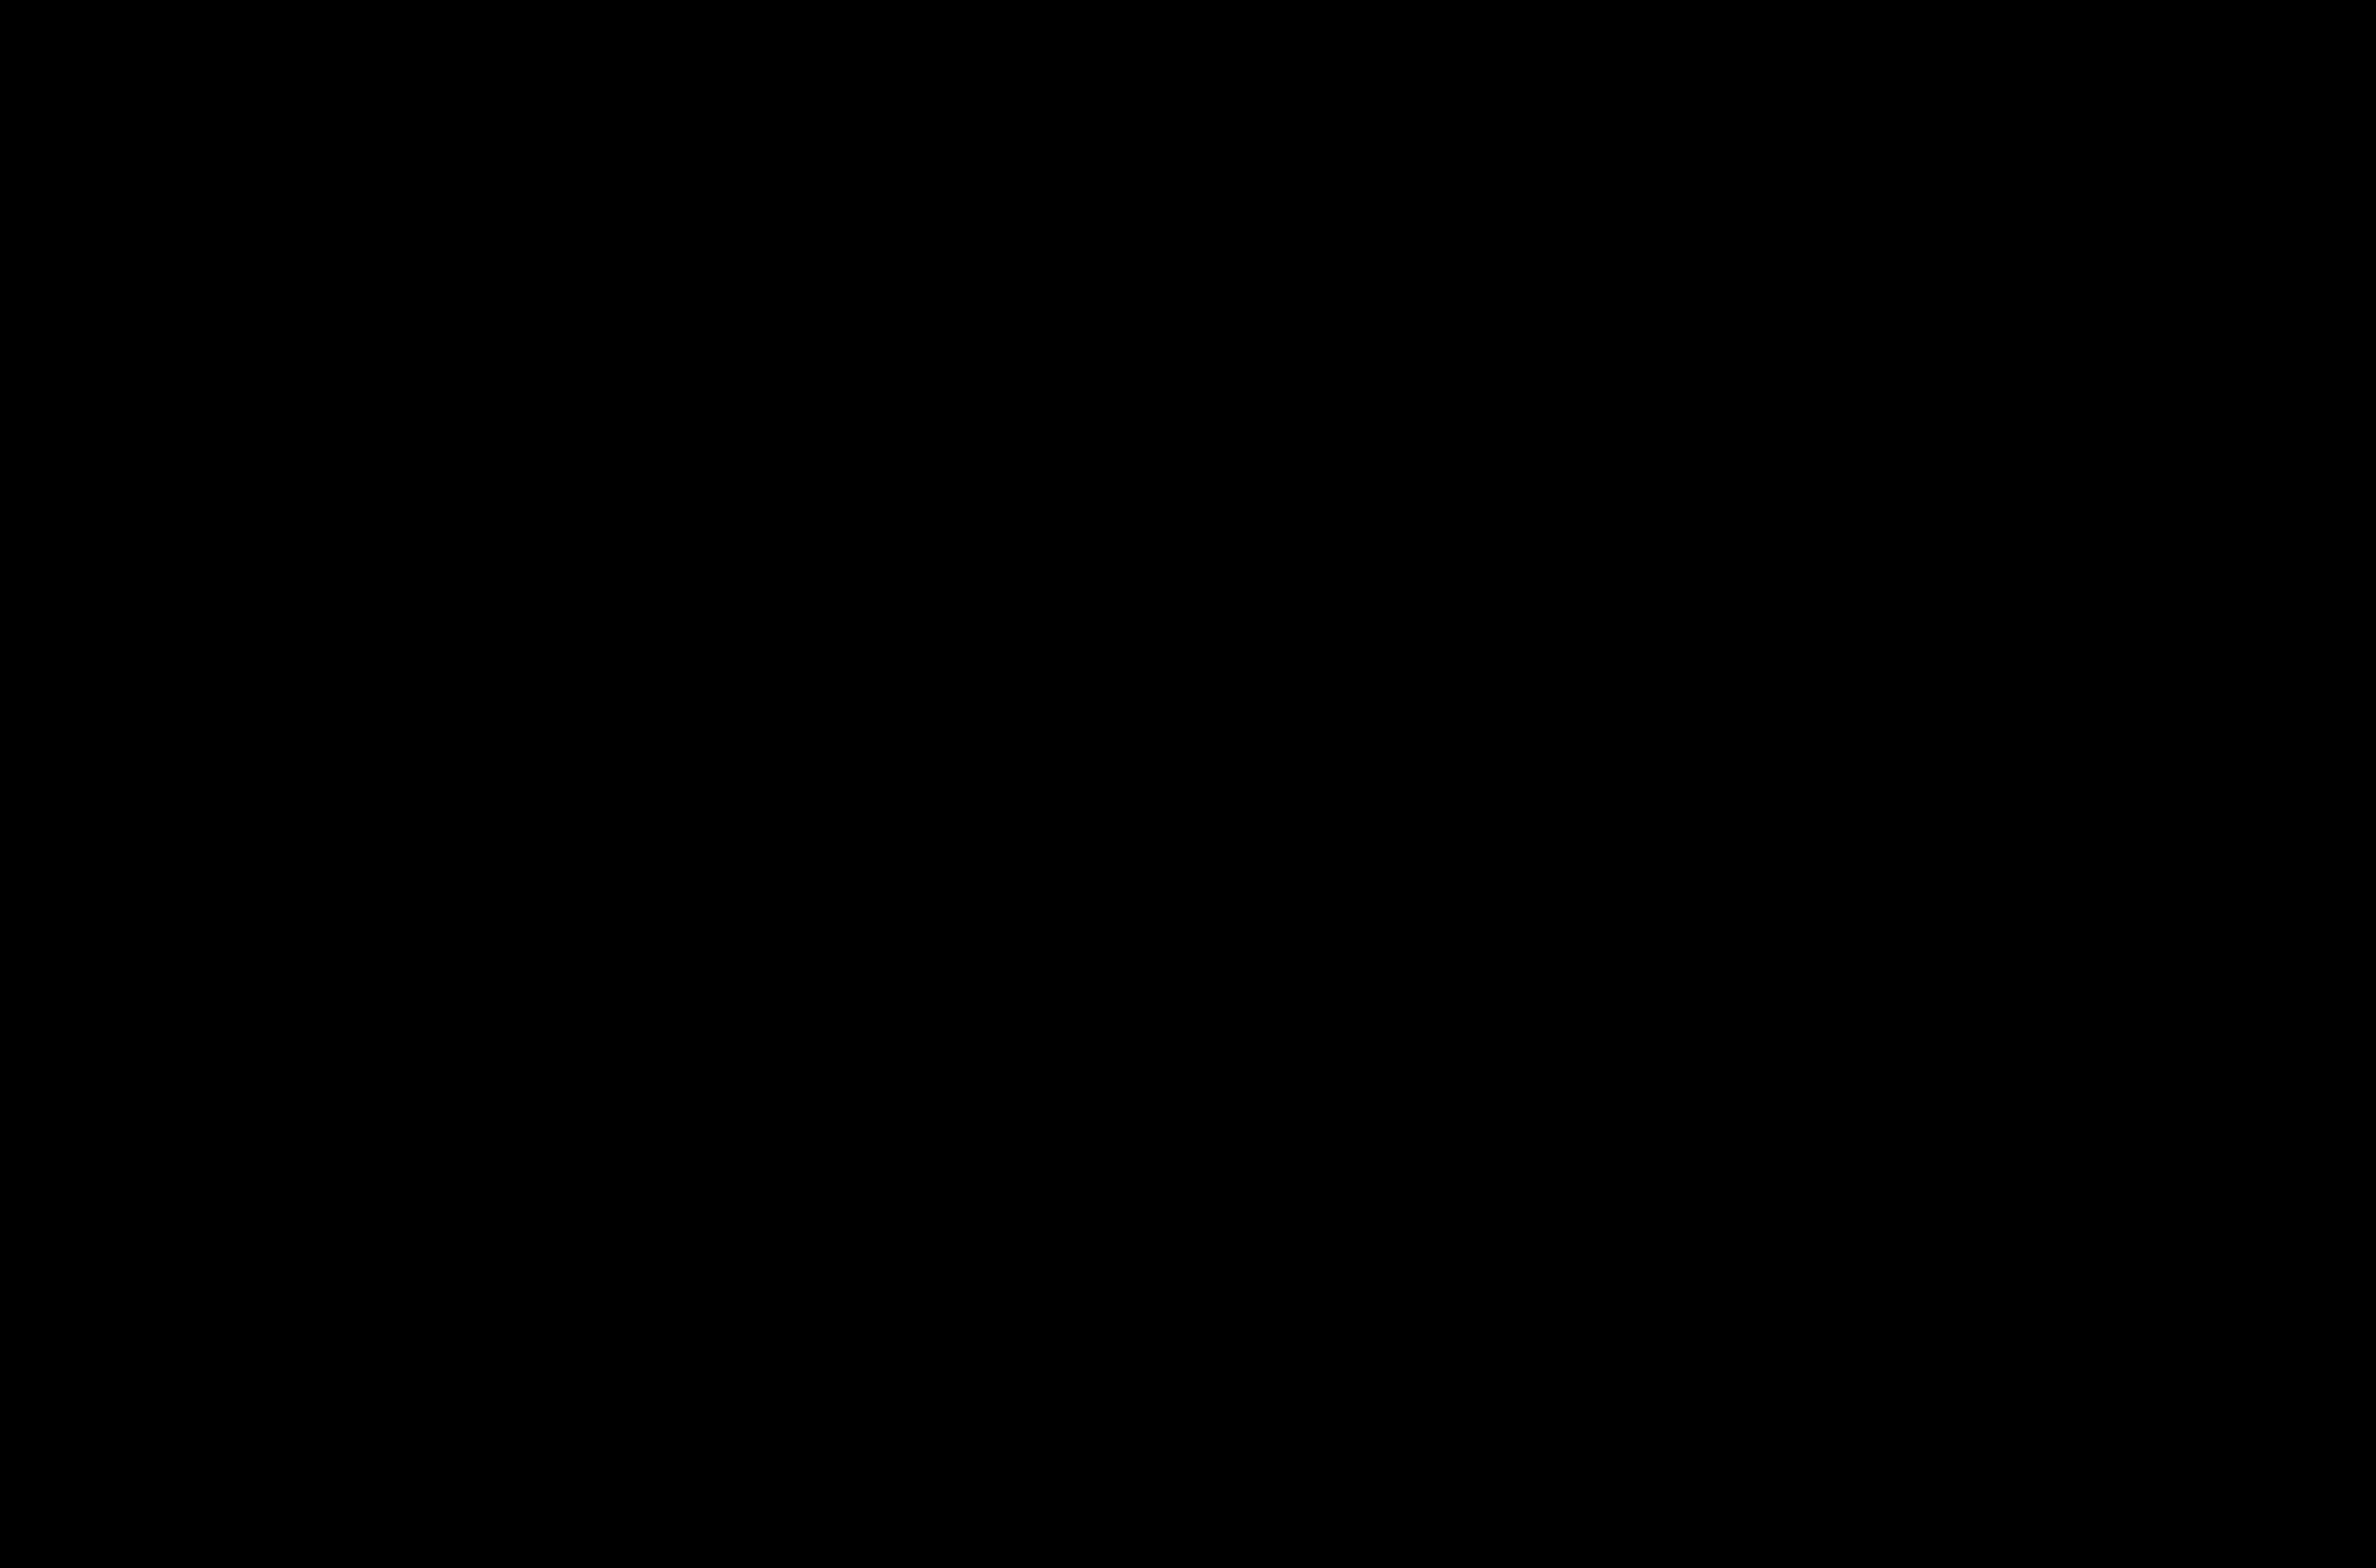 2400x1584 Clipart